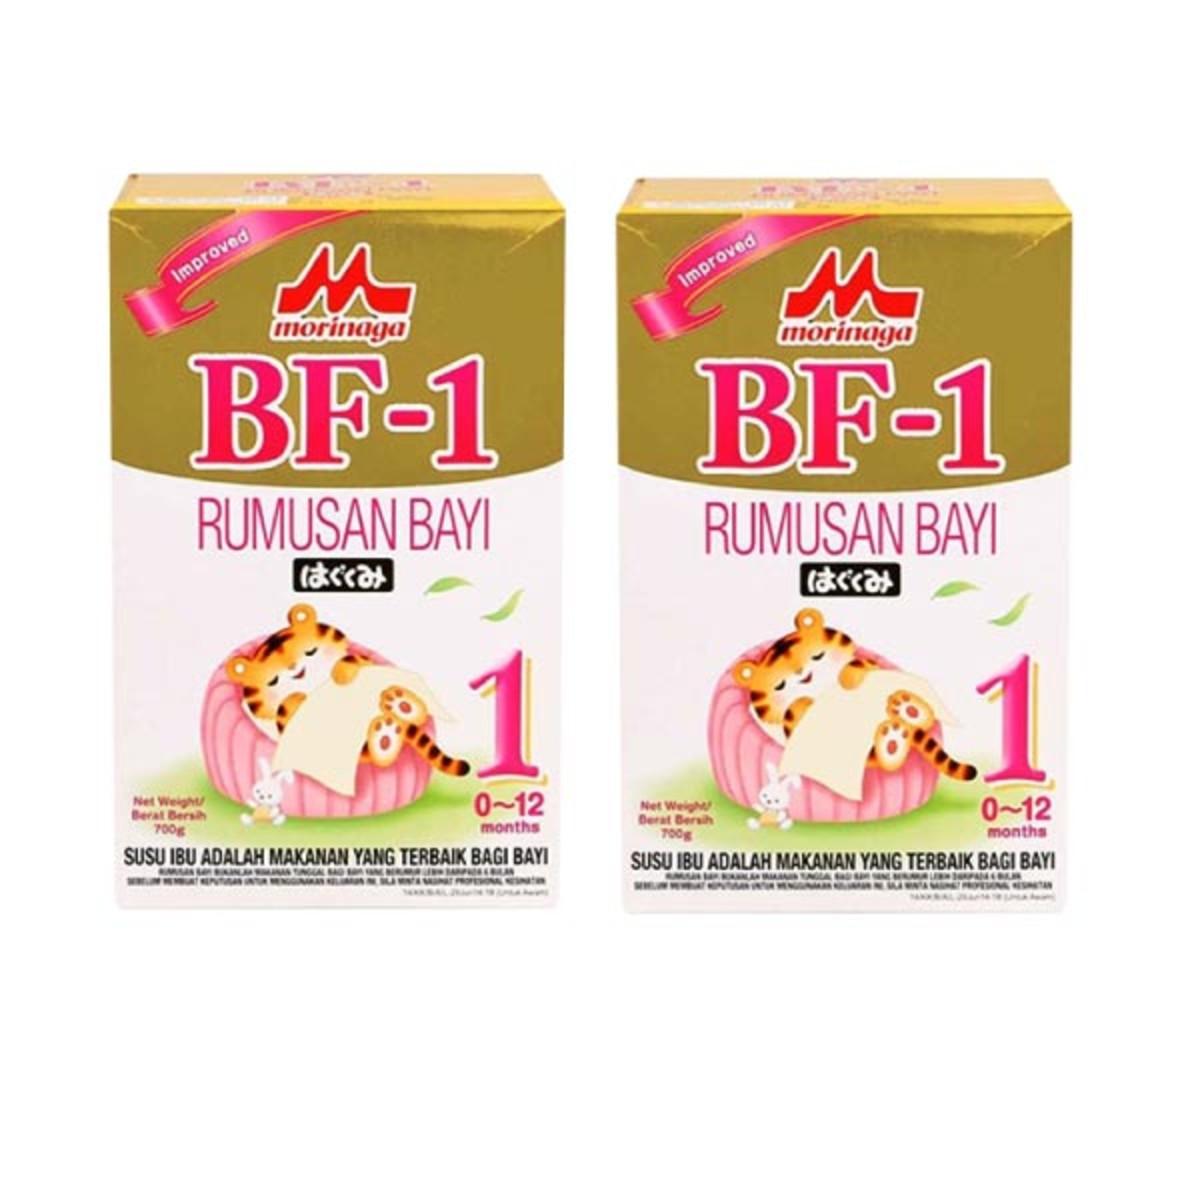 Morinaga BF-1 Step 1 (0-12 months) 700g X 2